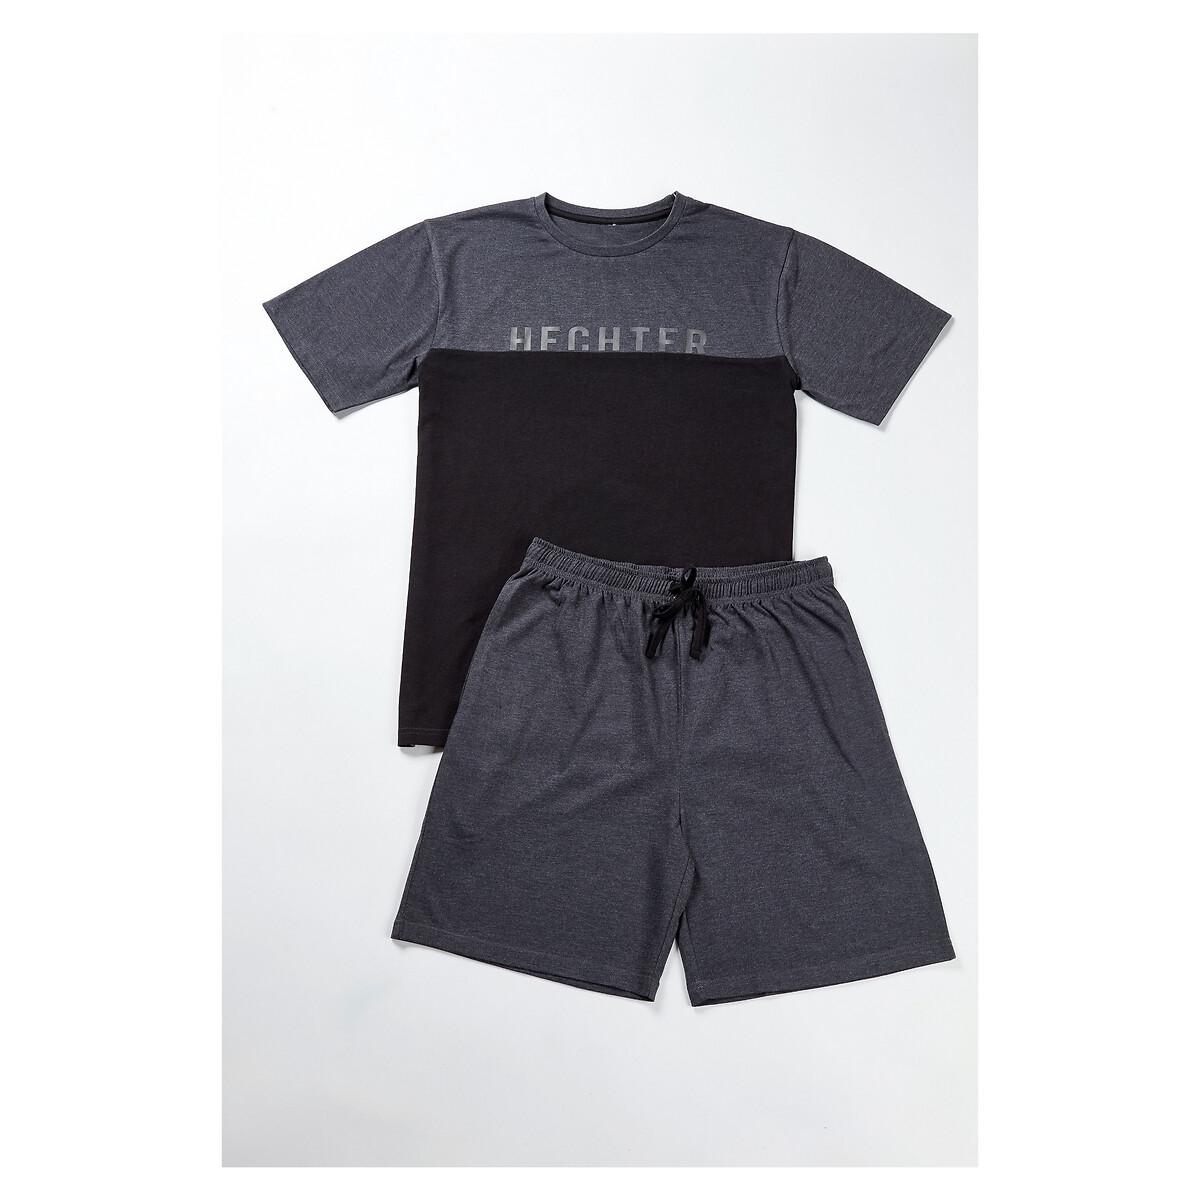 Фото - Пижама LaRedoute С шортами XXL серый пижама laredoute с шортами в полоску m синий